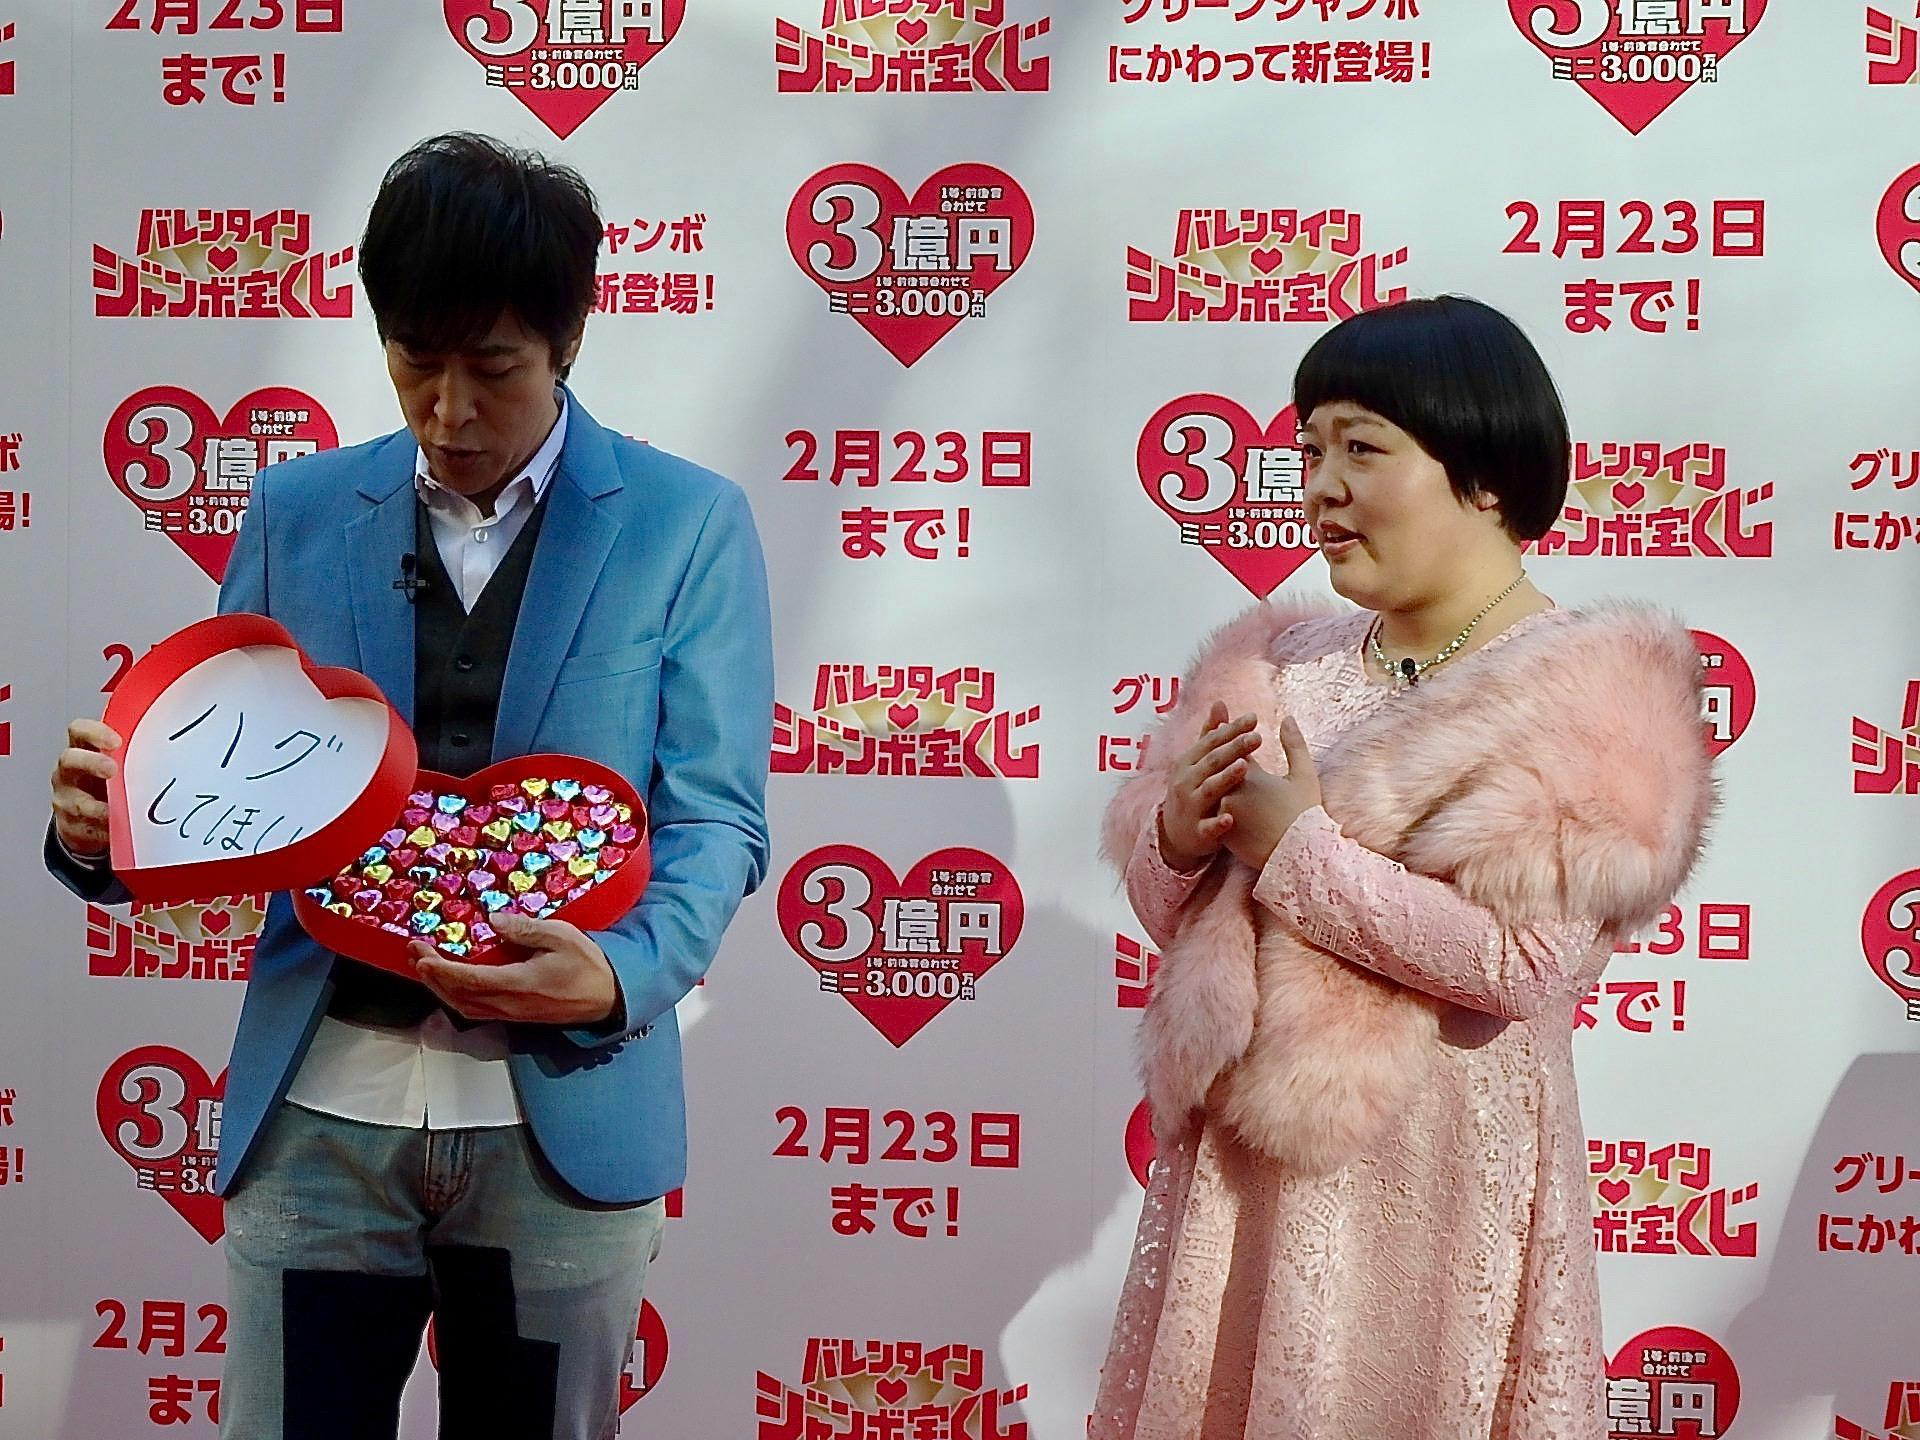 http://news.yoshimoto.co.jp/20180131180004-dcf282ba9fffc8963db97febb661b40af5b008c4.jpg